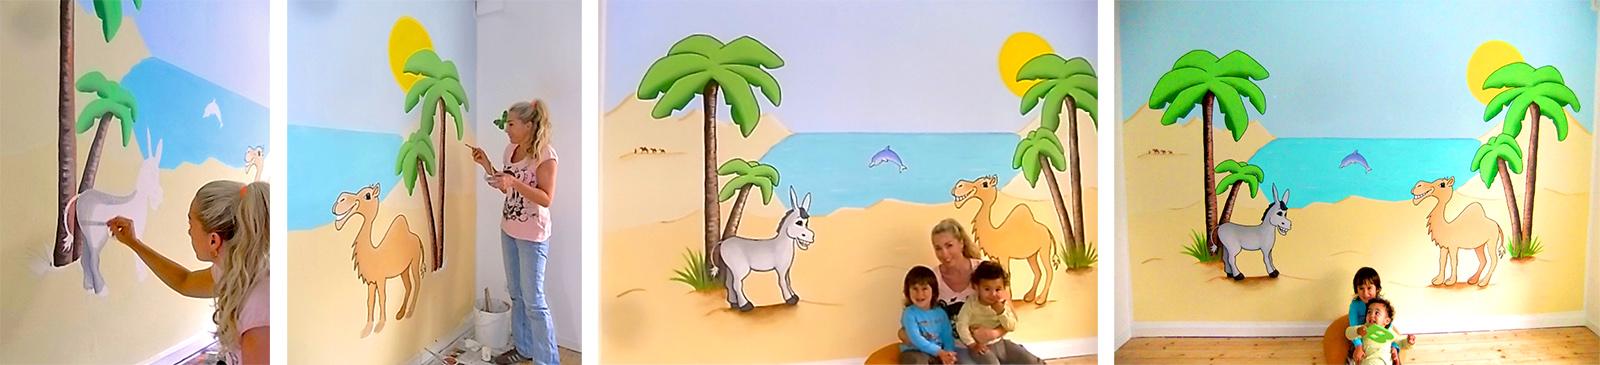 wandbemalung und wandgemlde fr kinderzimmer sweetwall wandmalerei fr das kinderzimmer die kita - Wandbemalung Kinderzimmer